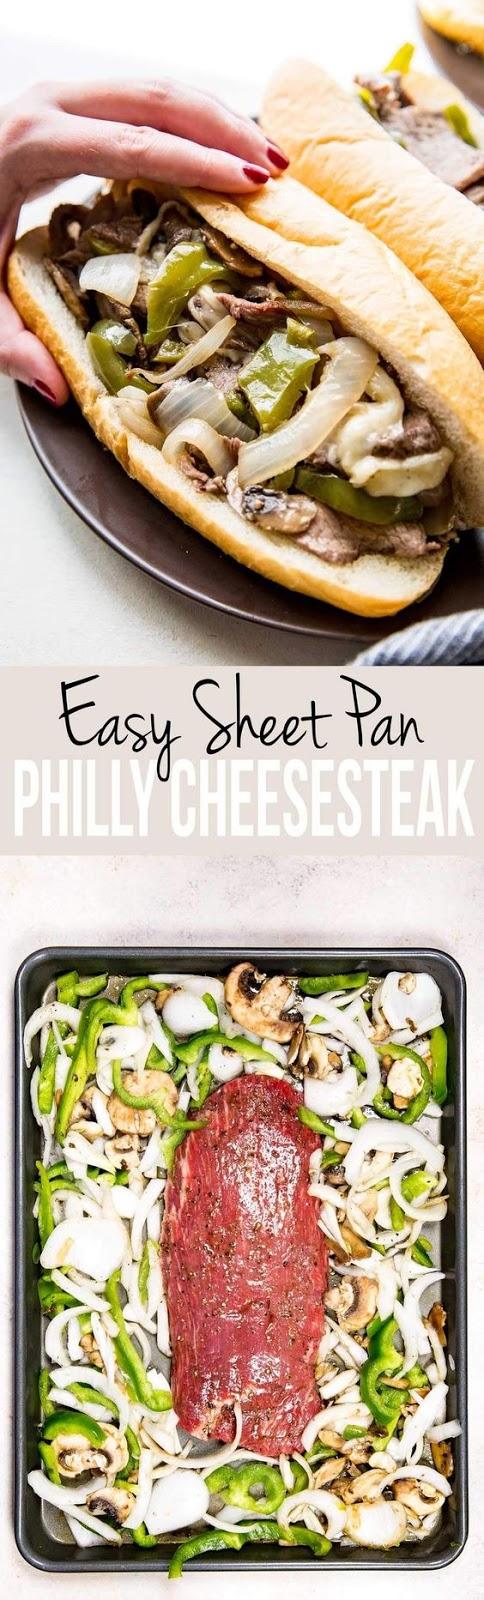 Sheet Pan Philly Cheese Steak